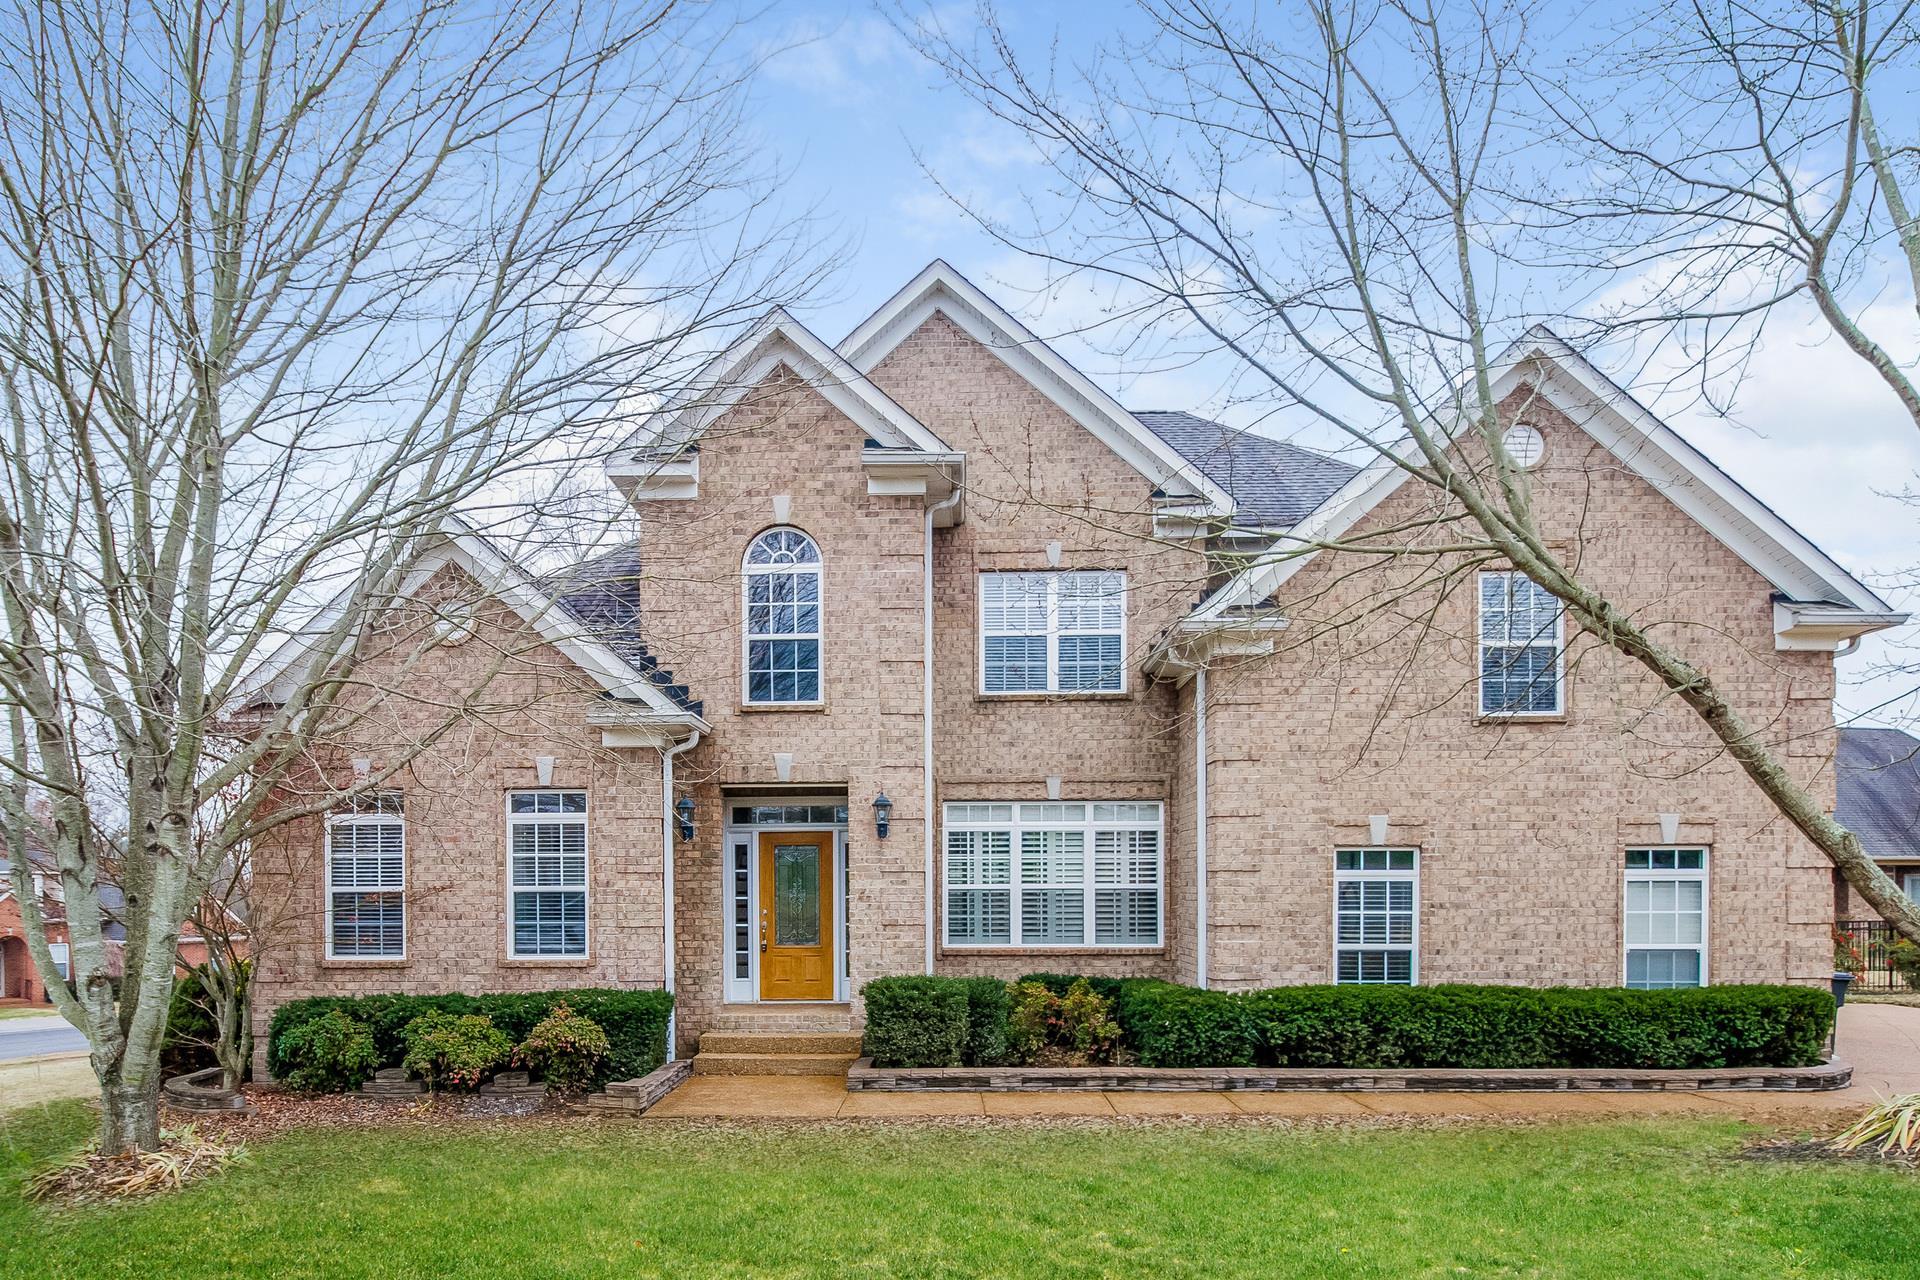 129 Deerfoot Ct, Hendersonville in Sumner County County, TN 37075 Home for Sale